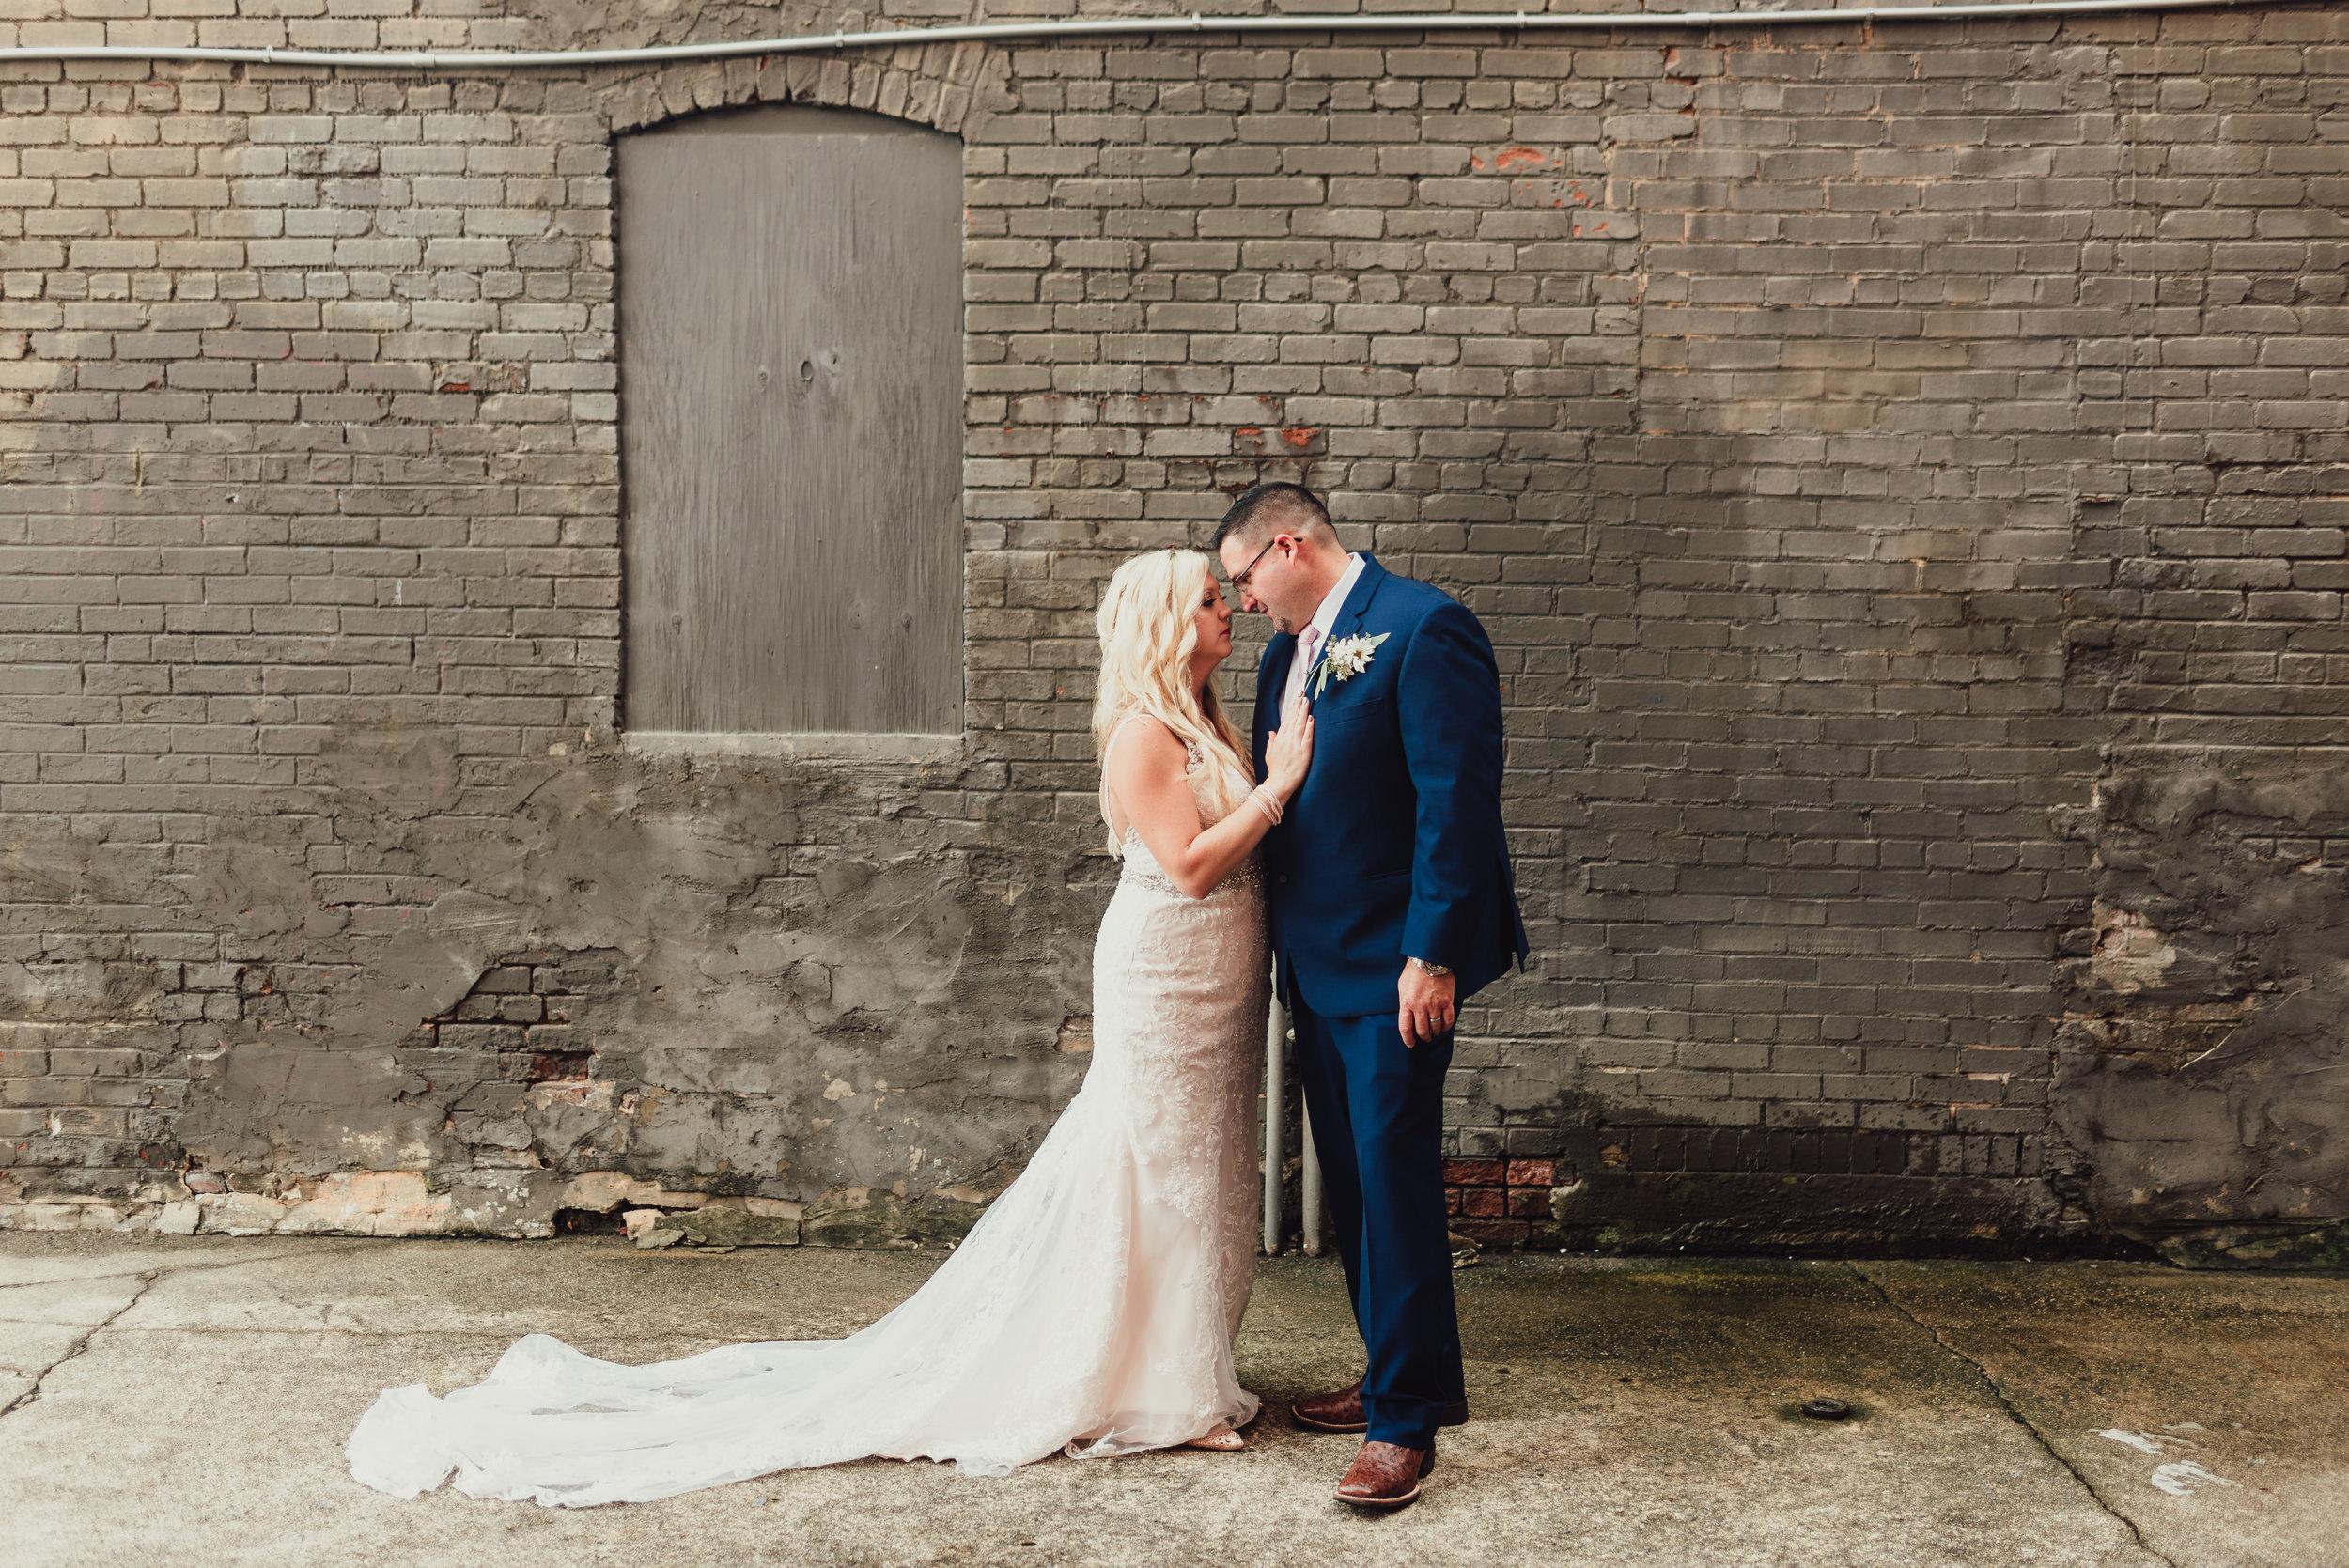 east-tn-wedding-photographer-tennessee-elopement-photographer-kingsport-tn-wedding-photographer (646 of 1001).jpg